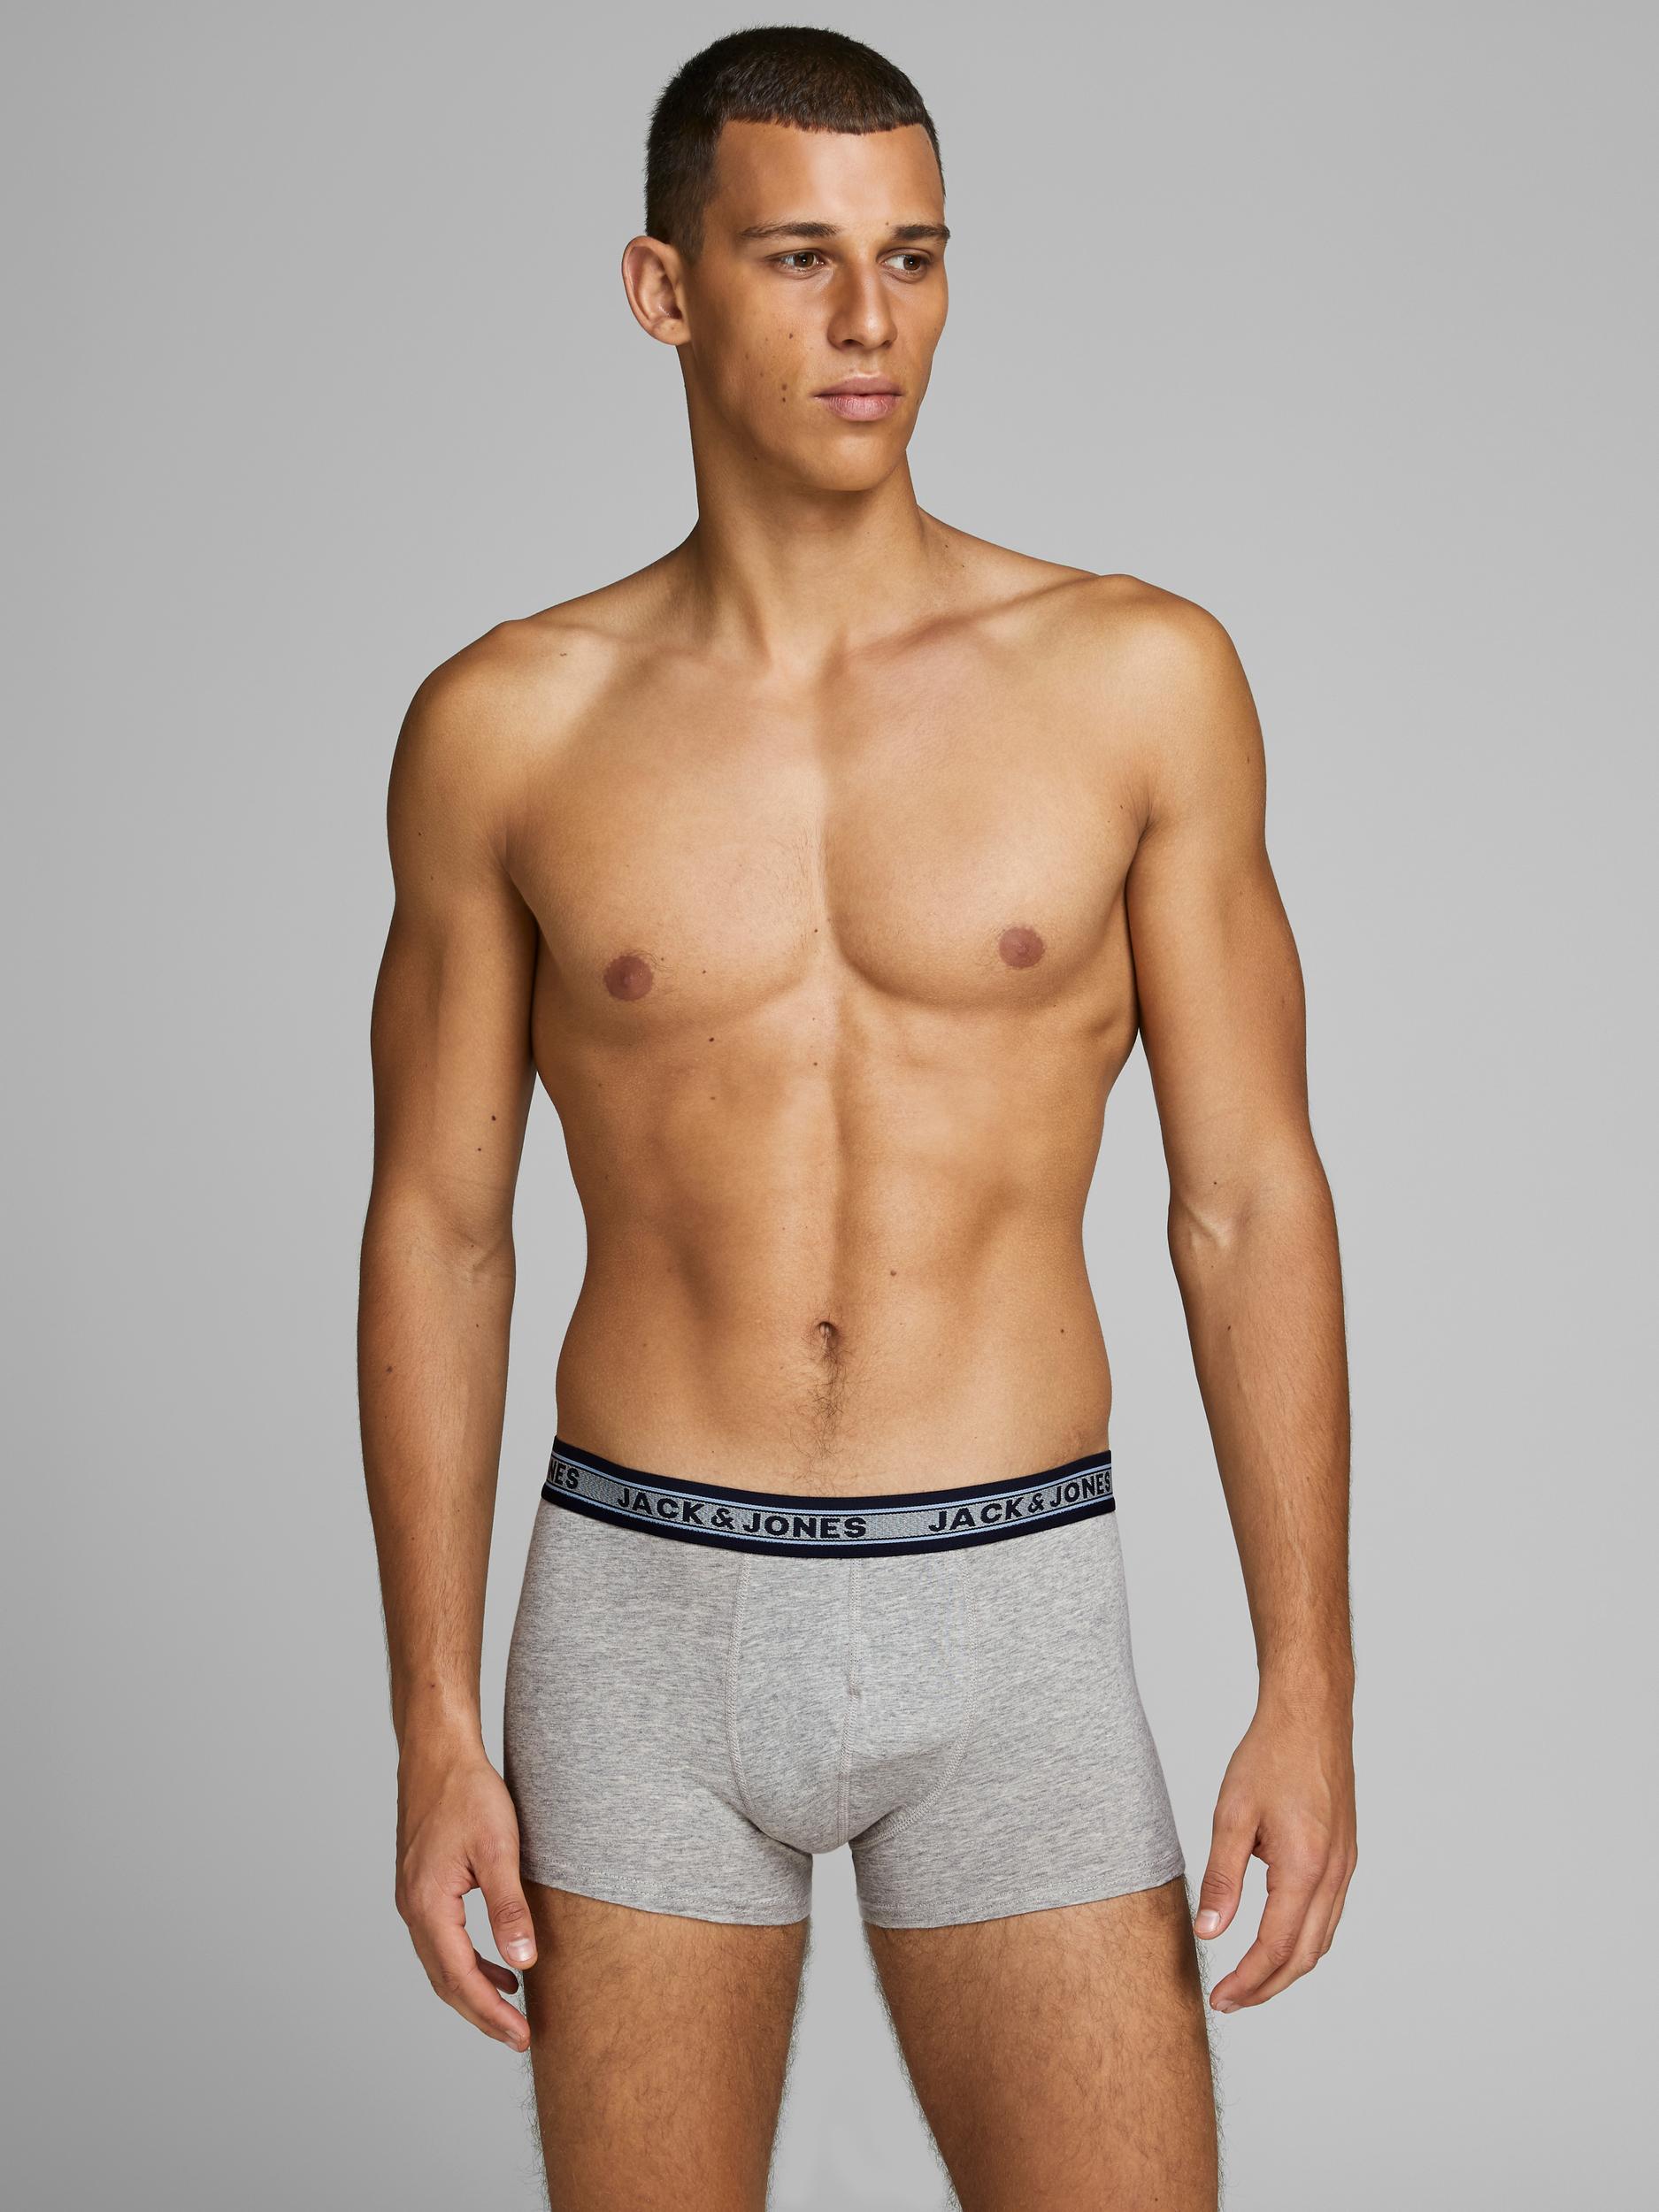 Jack & Jones 5-pak Oliver boxershorts, dark grey melange, large